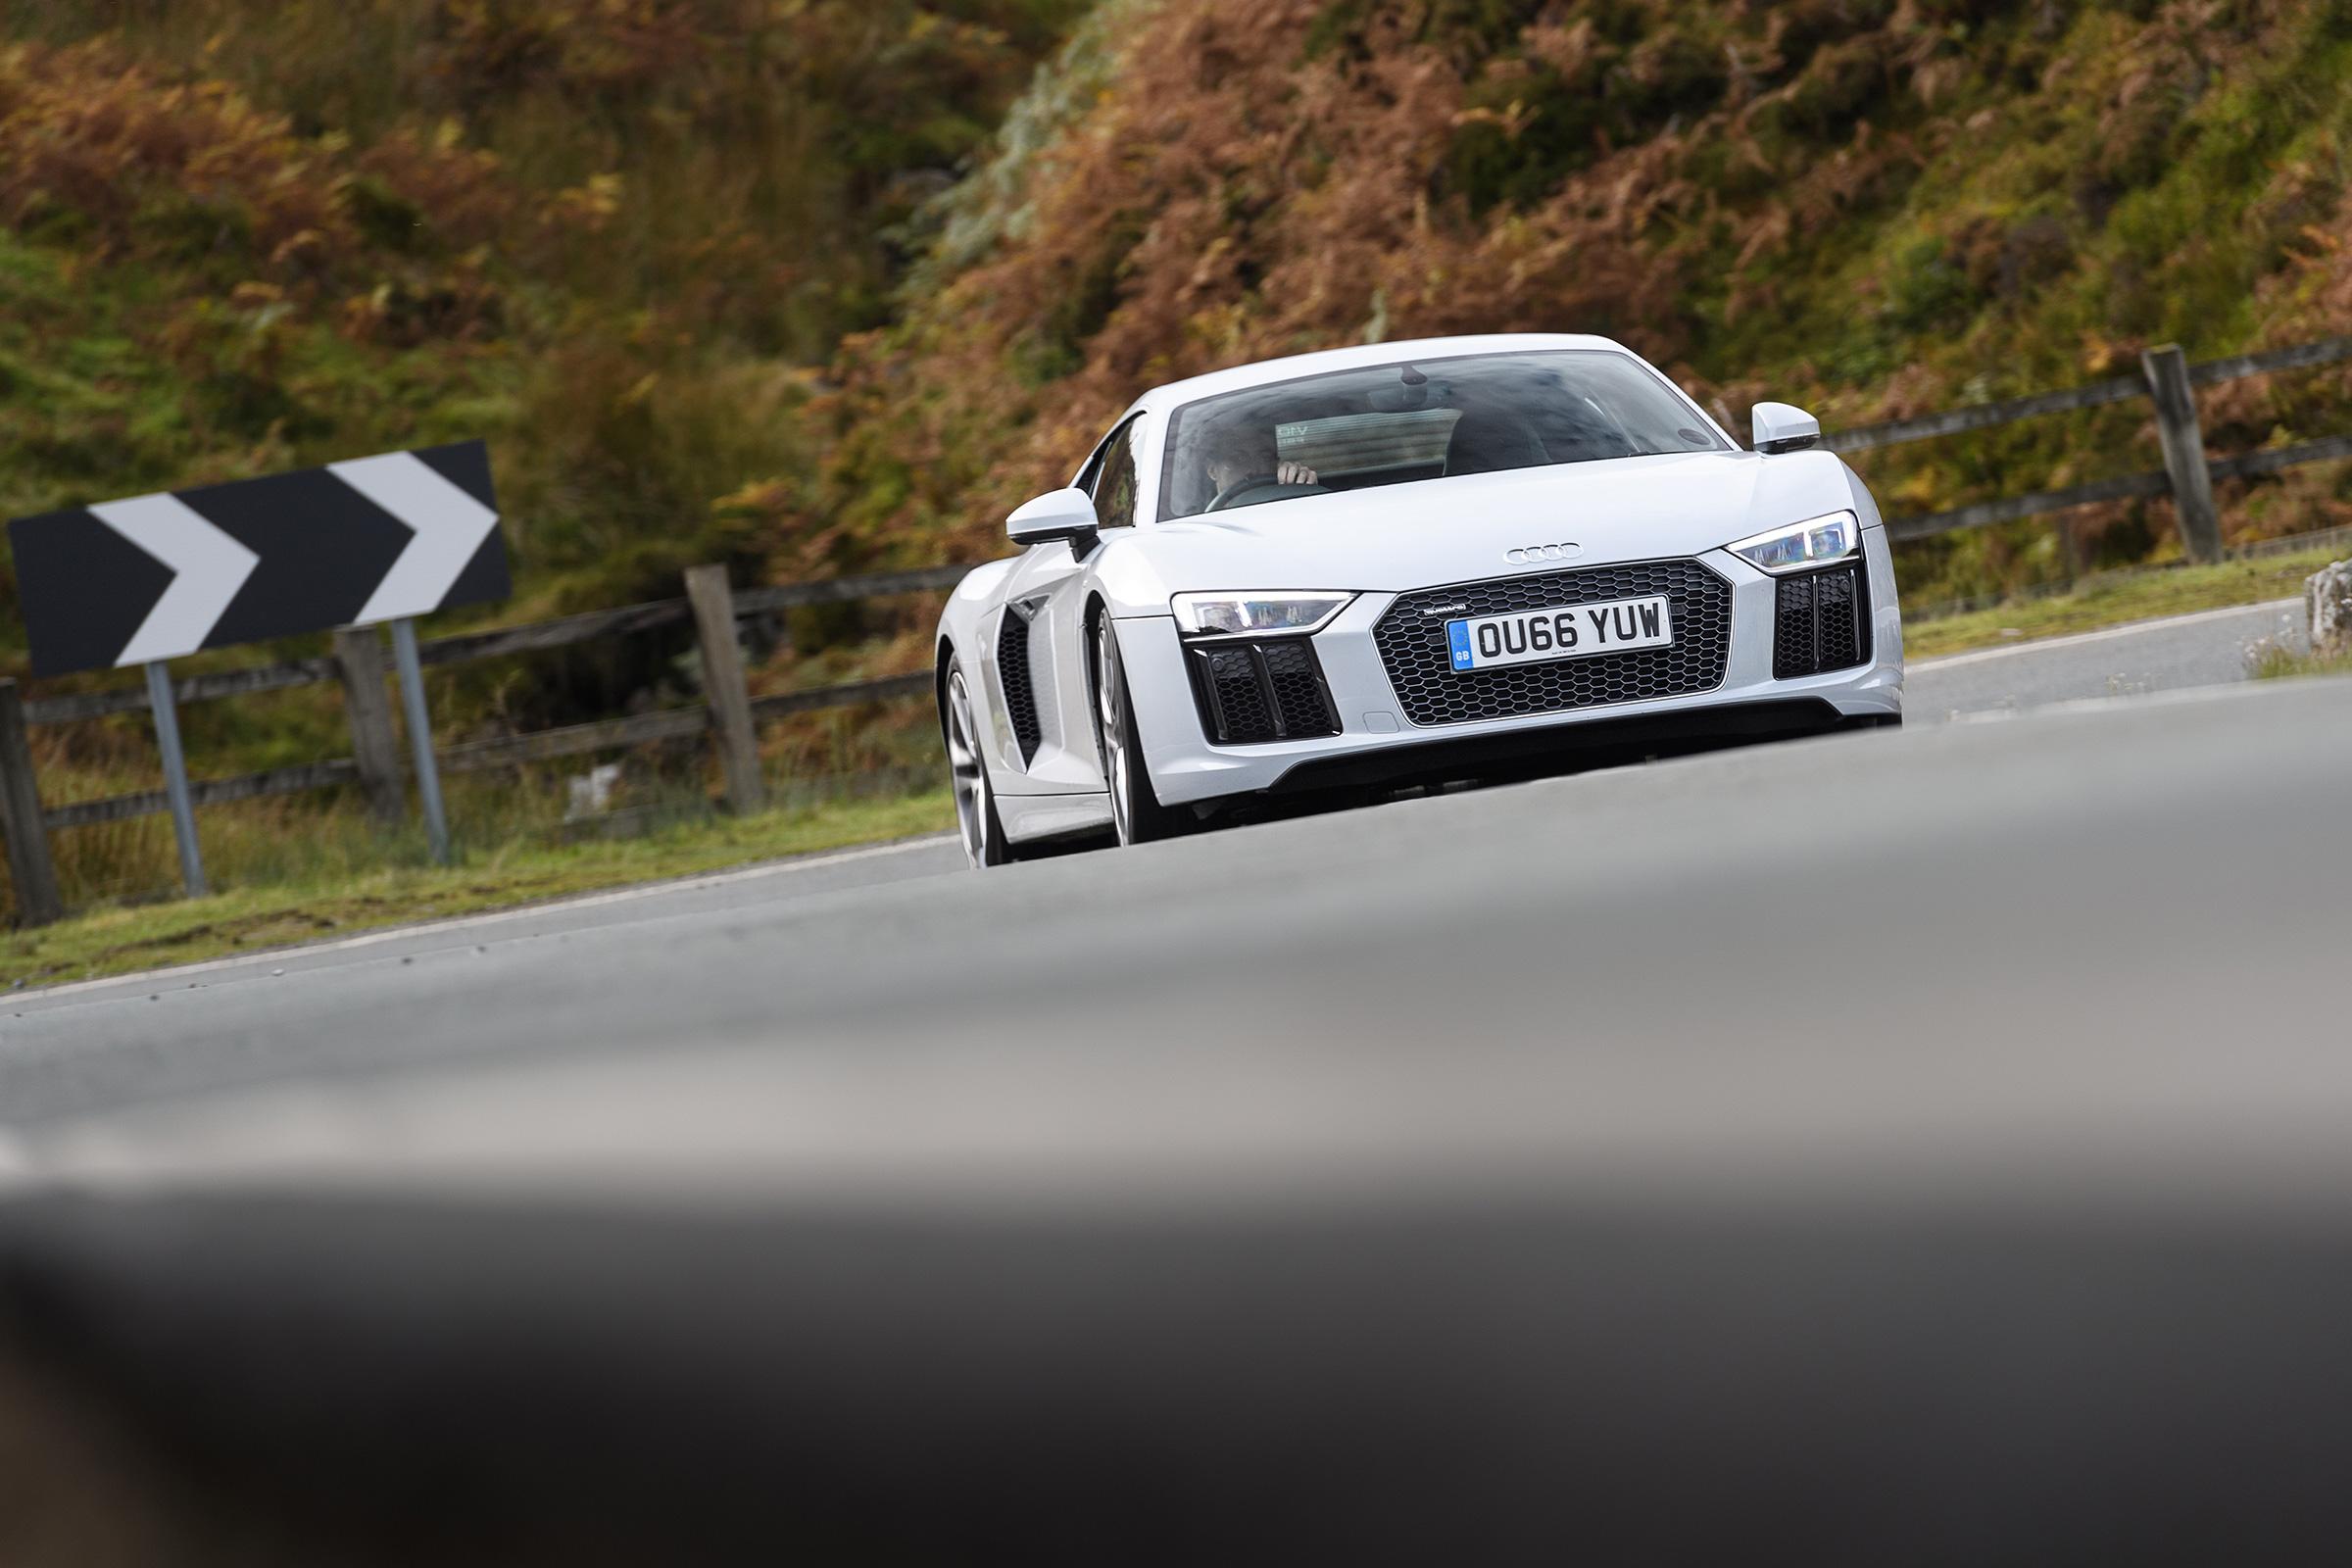 Mclaren 540c Vs Porsche 911 Turbo Vs Audi R8 Review